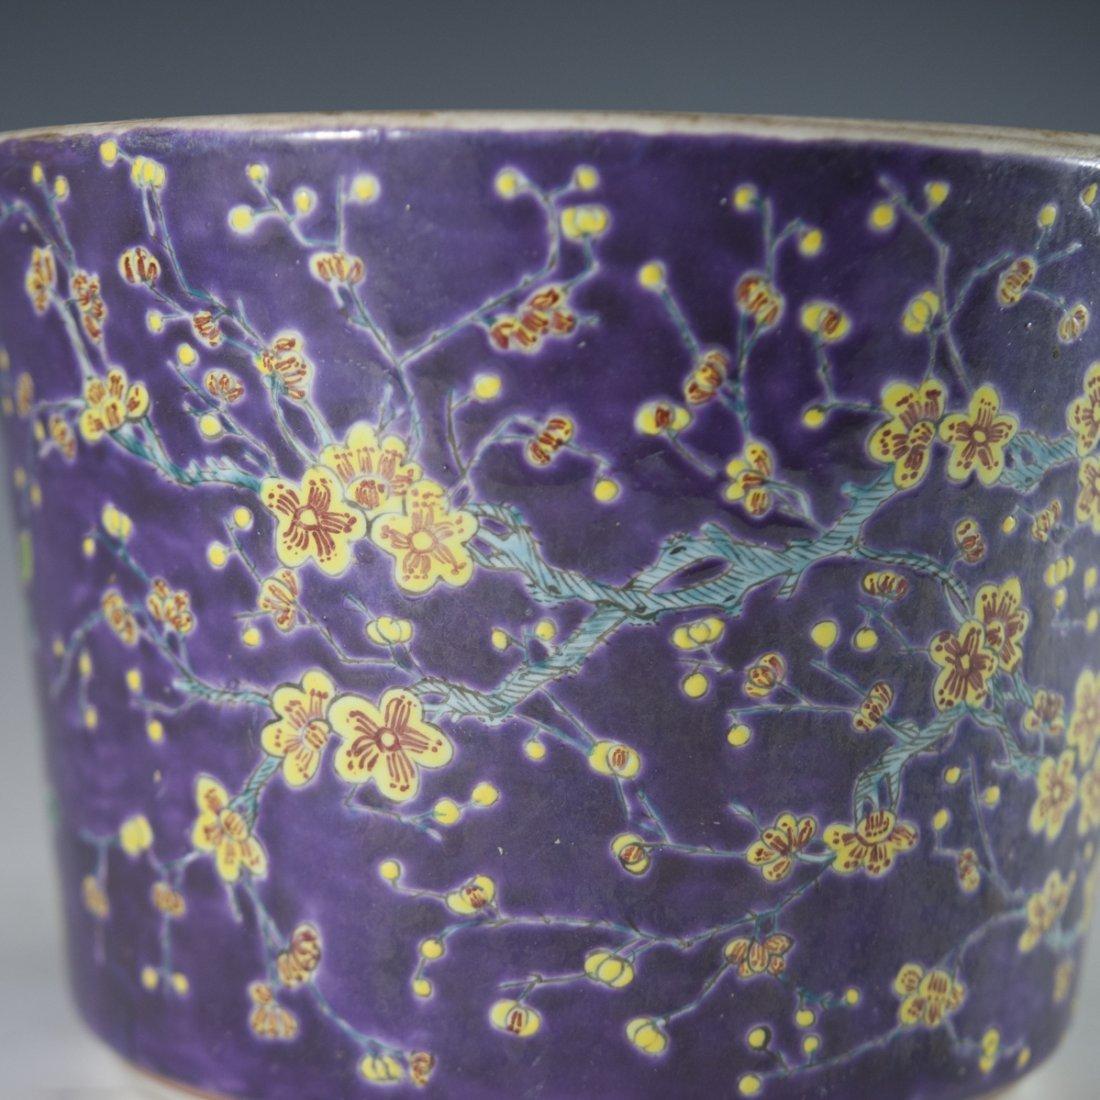 Chinese Porcelain Daya Zhai Cache Pot - 4